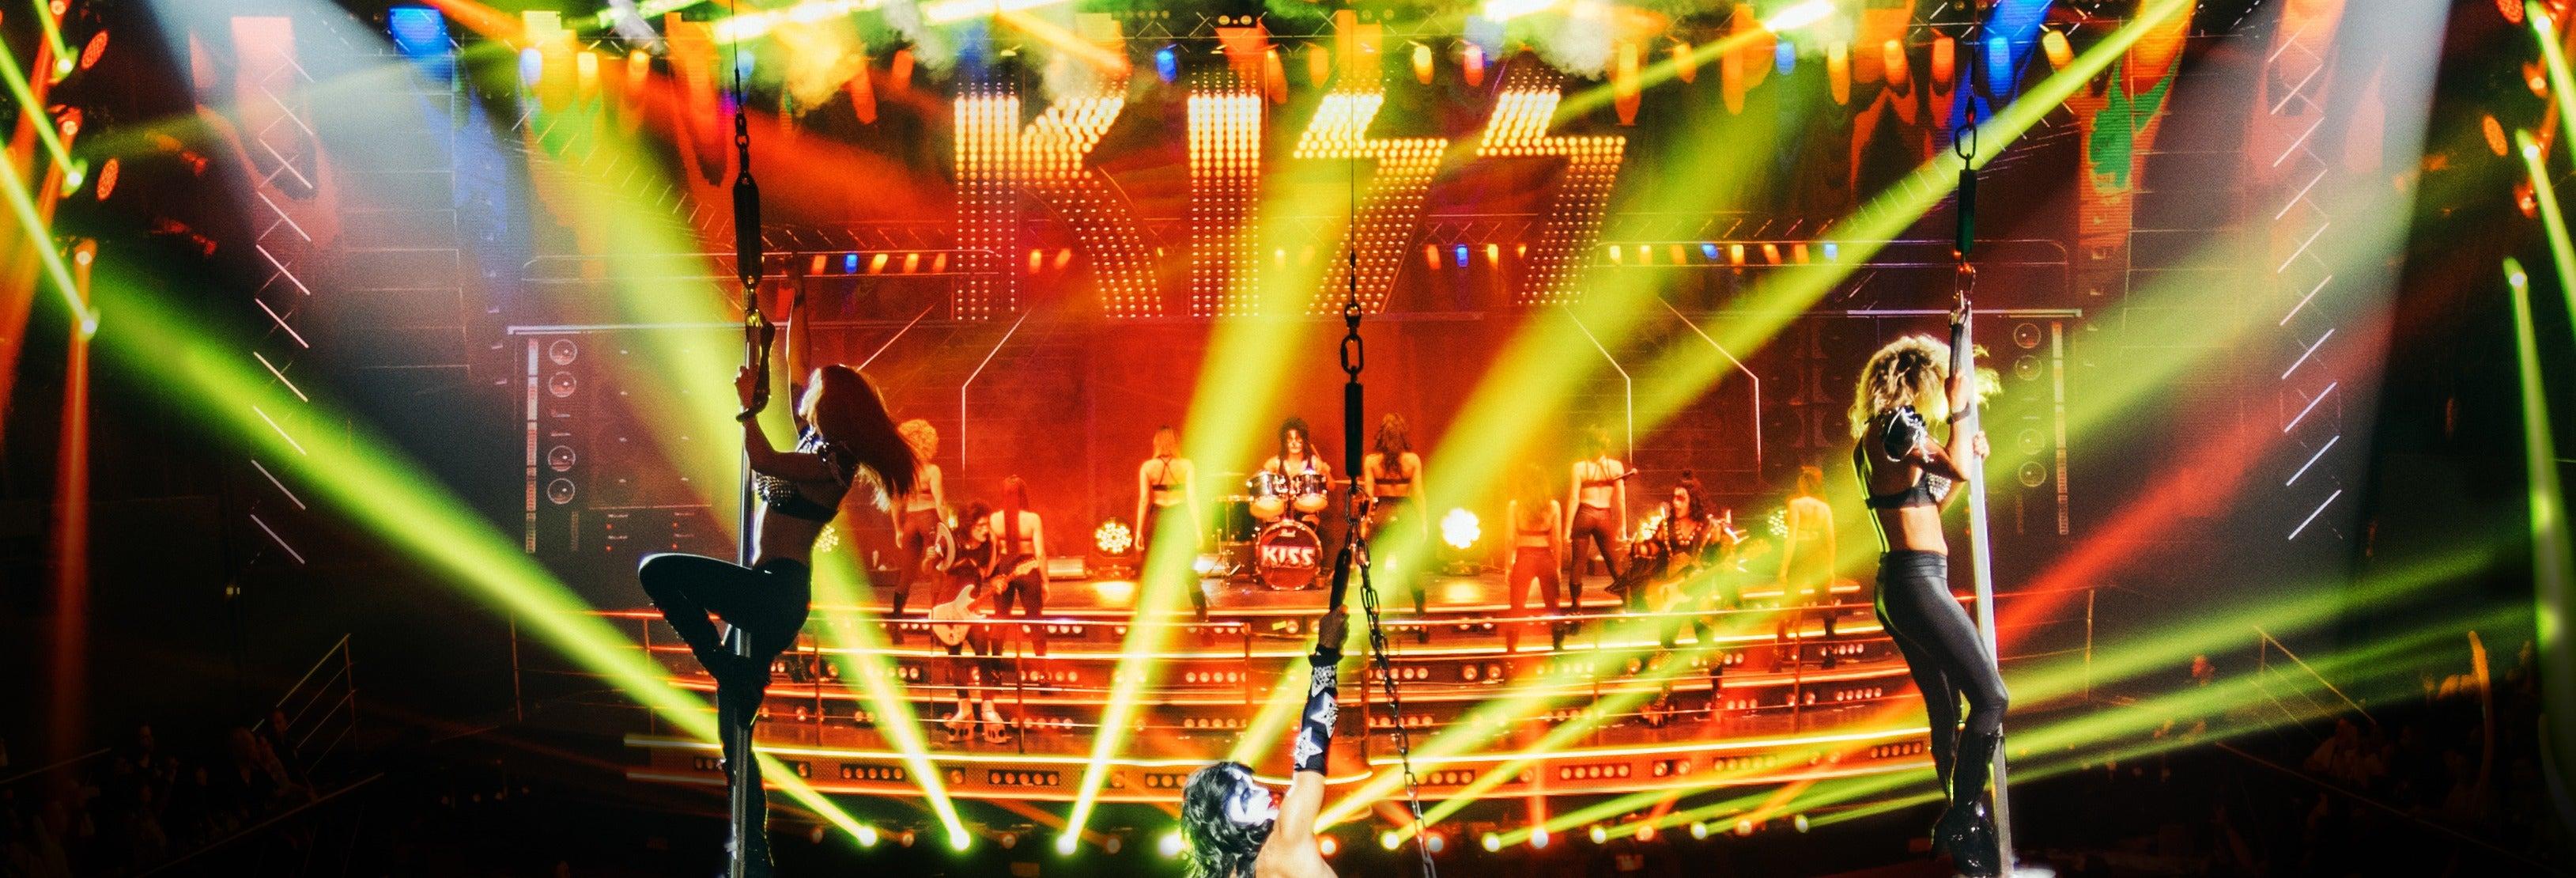 Festa na discoteca Coco Bongo